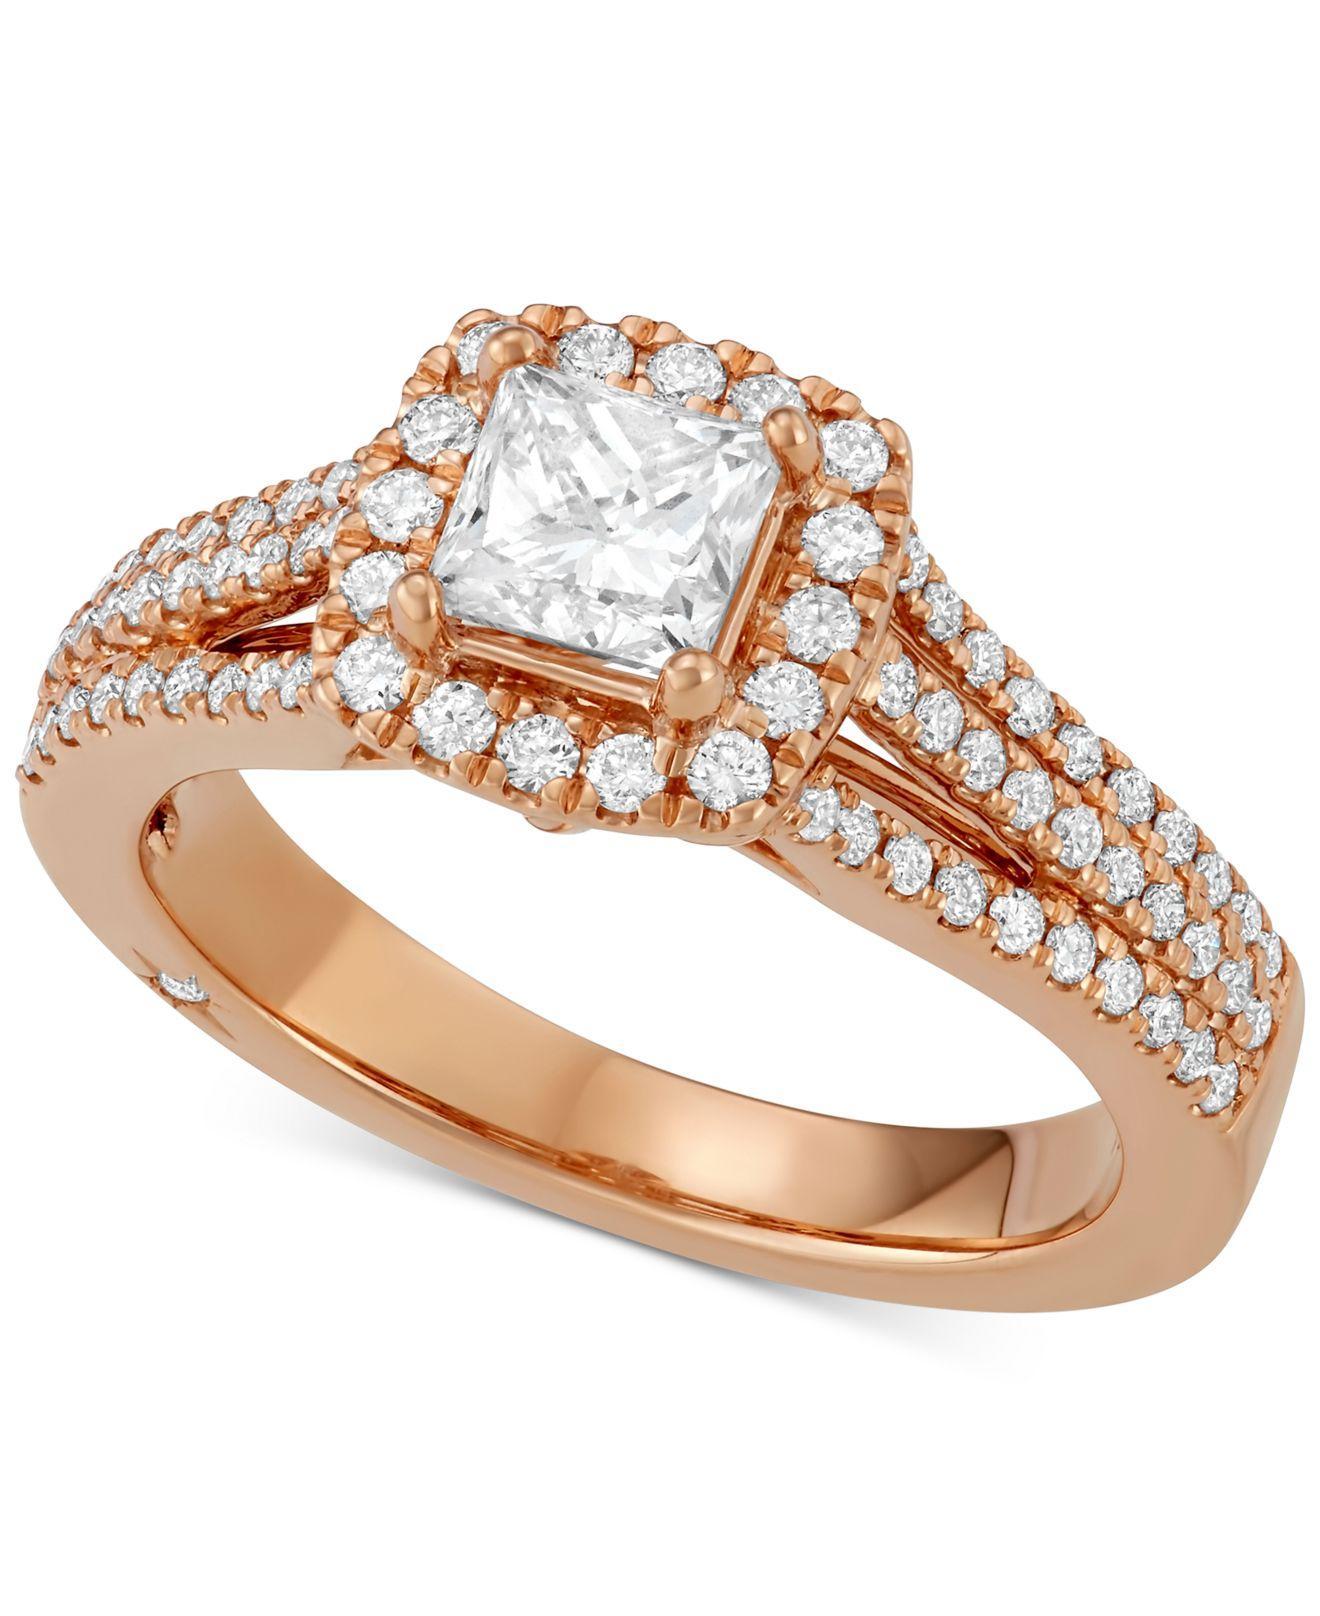 6048fc7f4aec8c Macy's Celeste Halo By Marchesa Princess Cut Diamond Engagement Ring ...